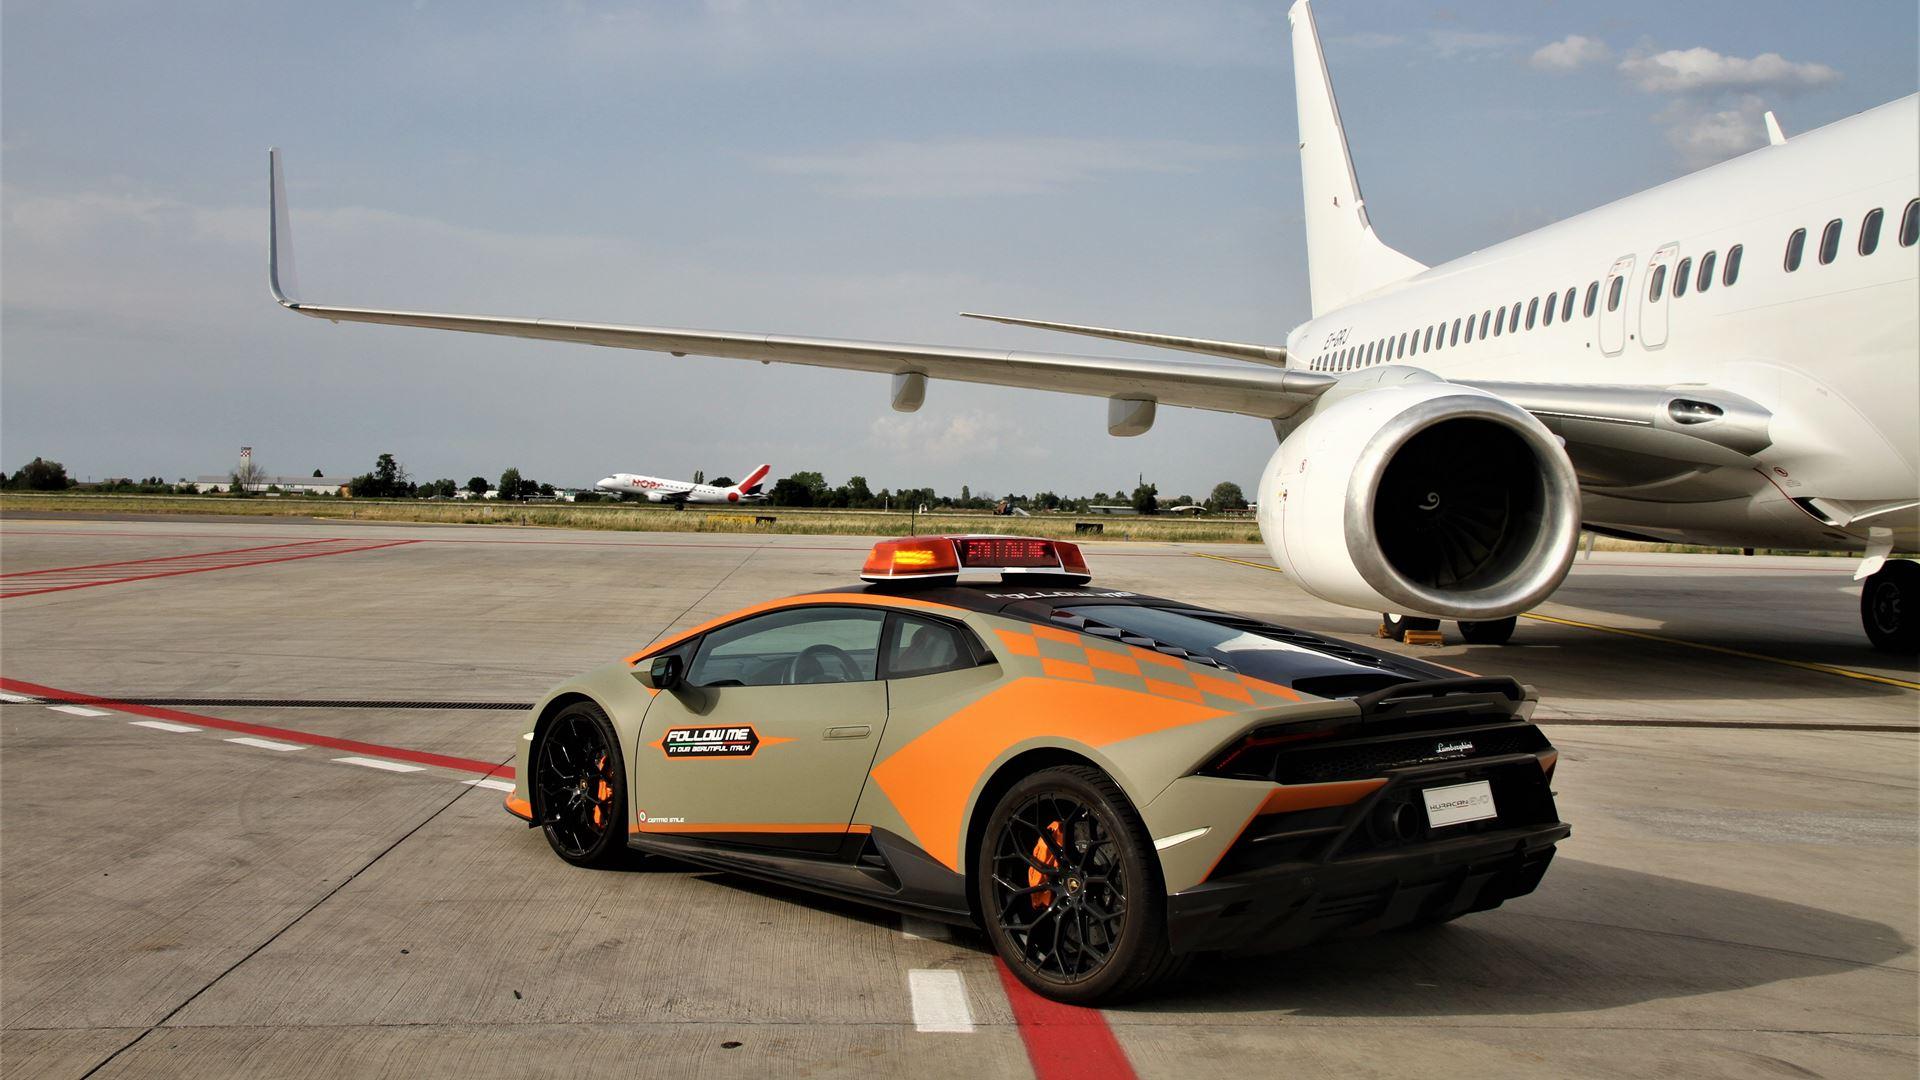 A new Lamborghini Huracán EVO follow-me car for Bologna Airport - Image 5